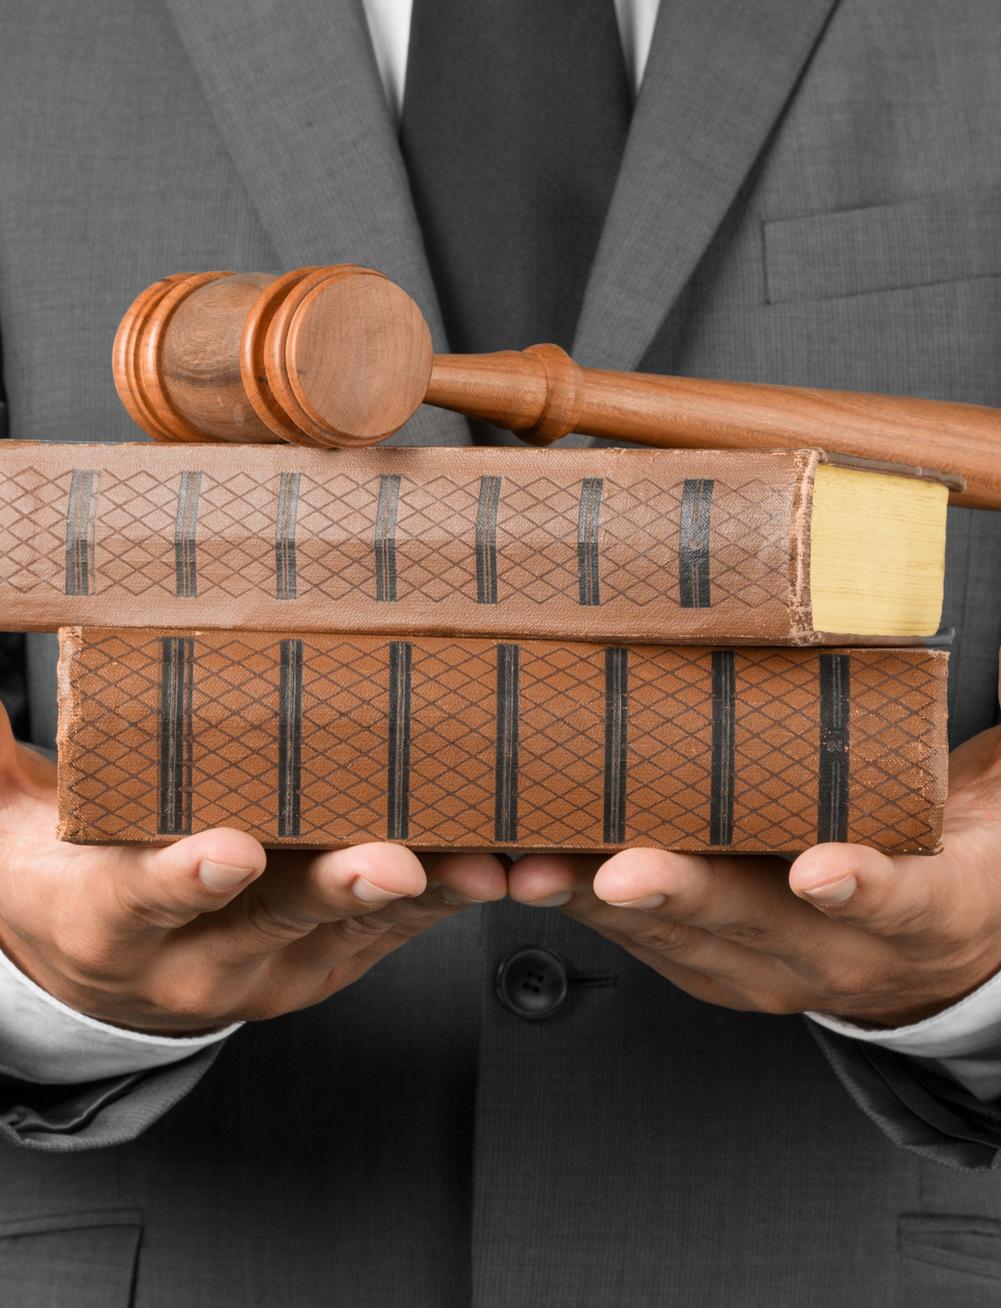 personal injury lawyers perth